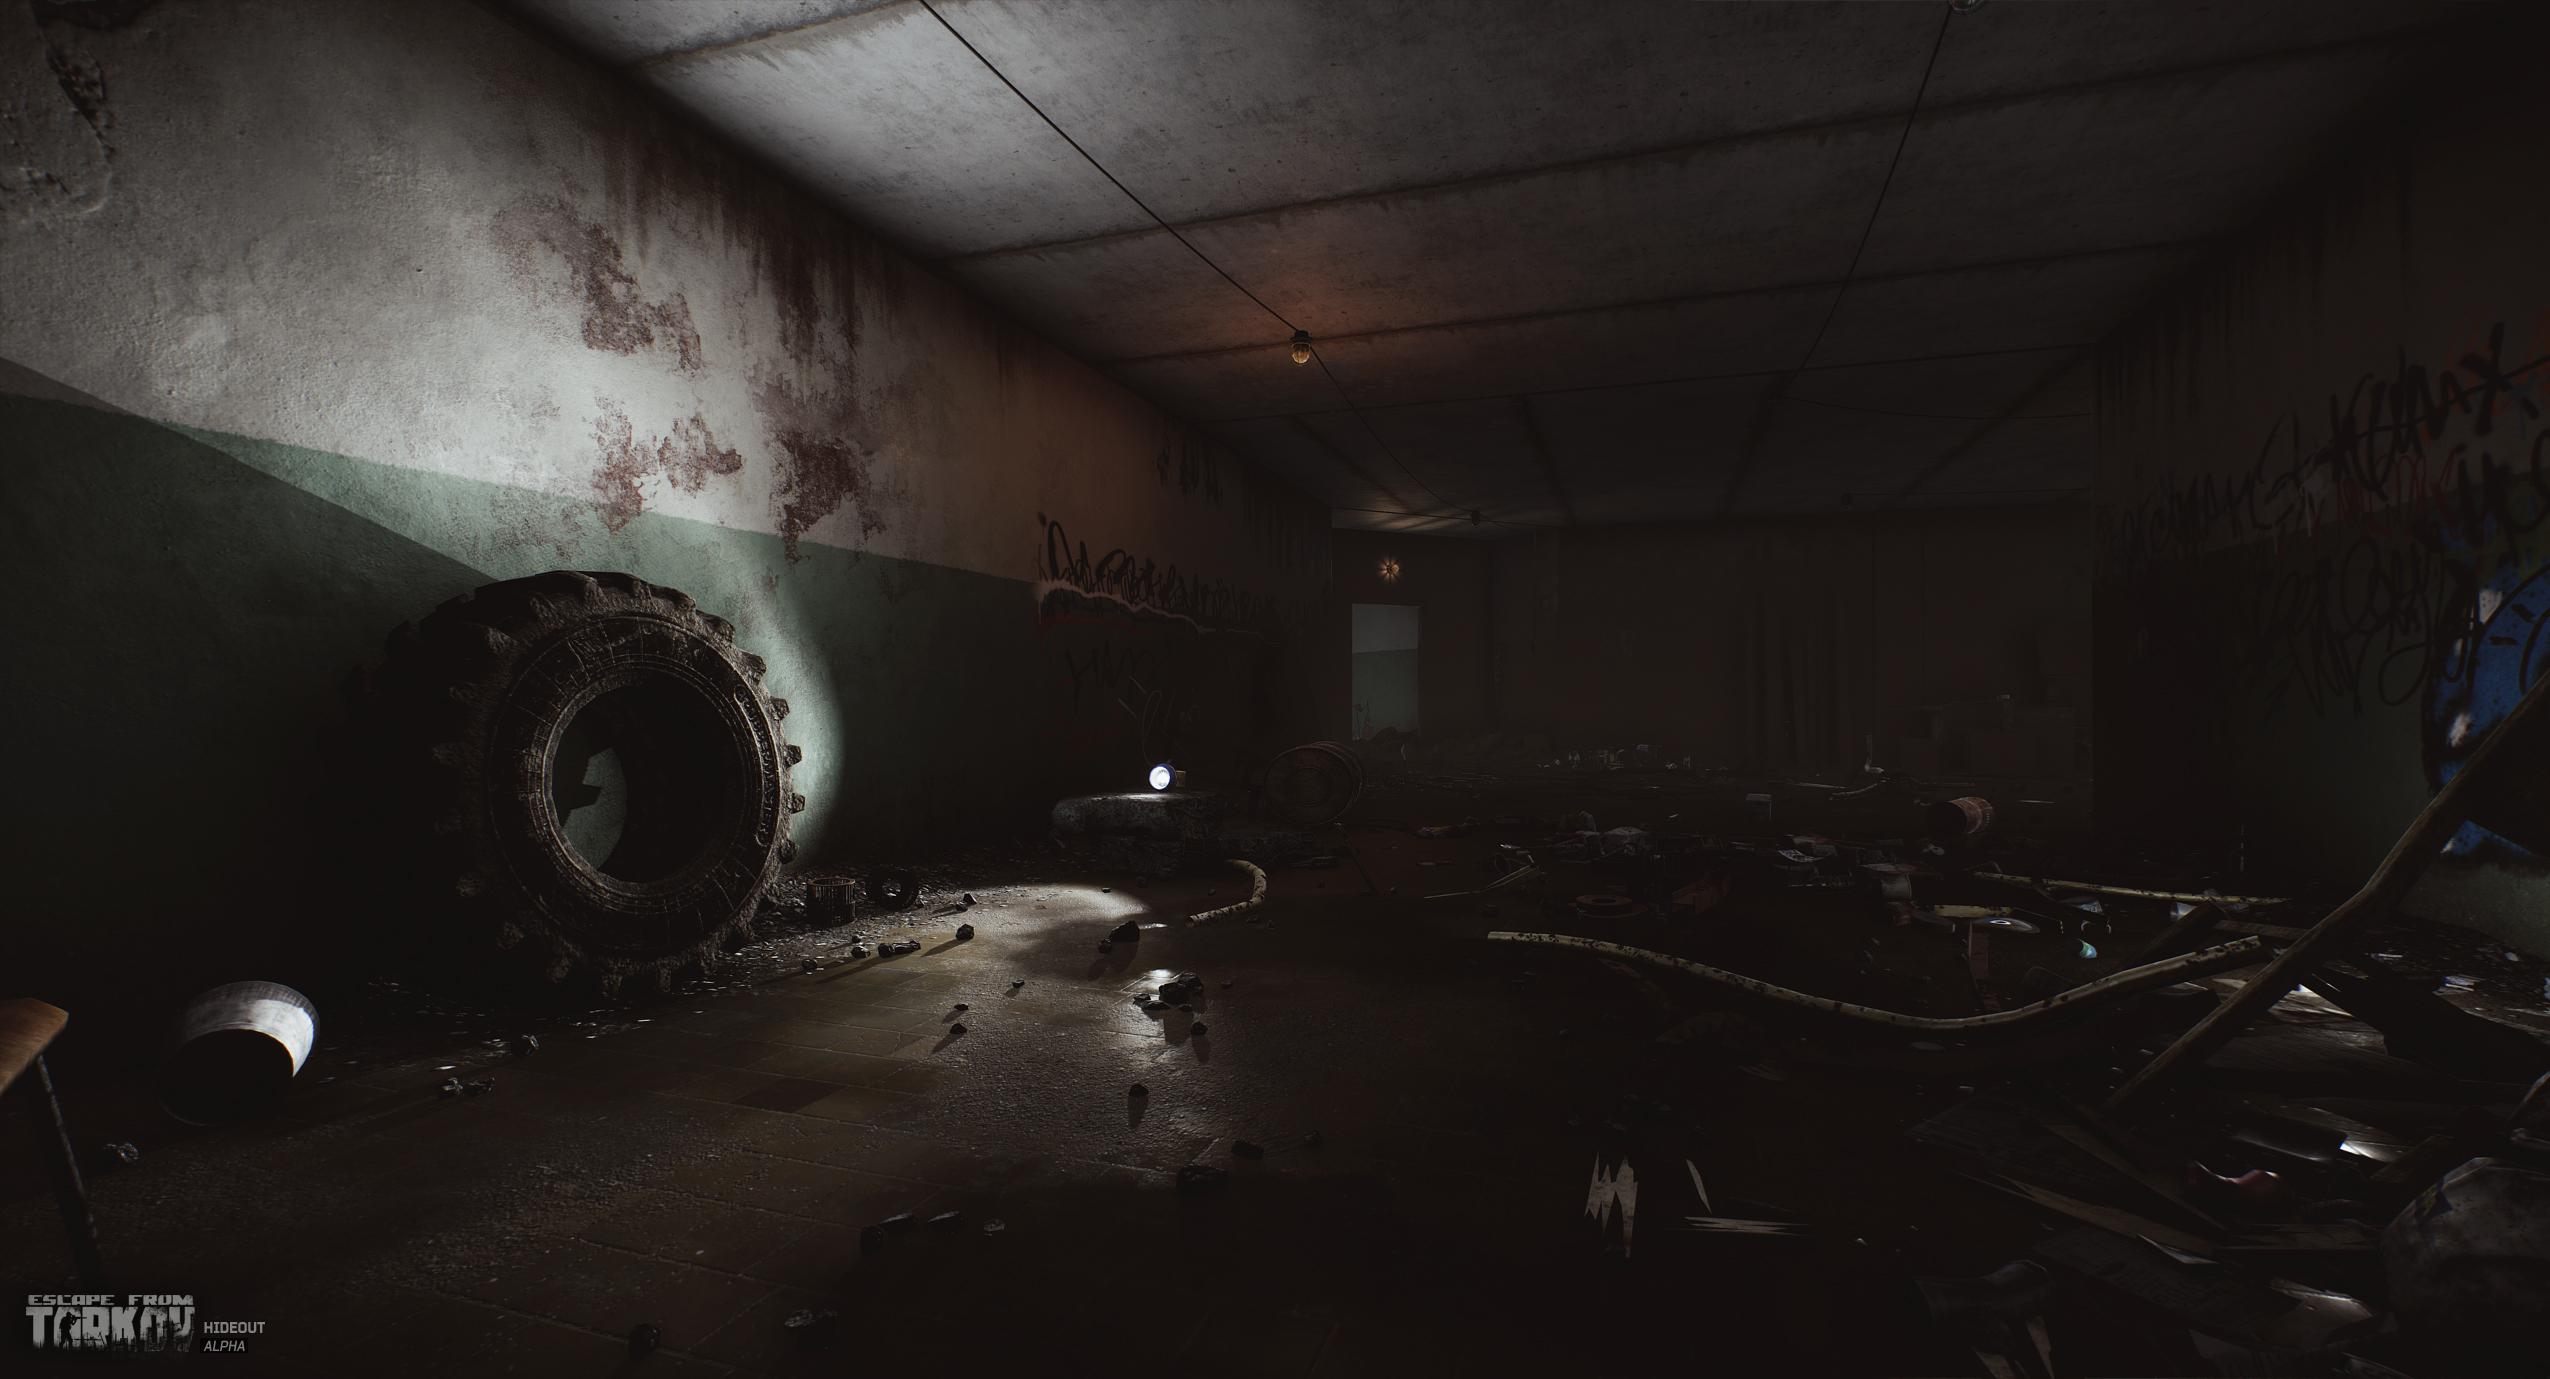 escapefromtarkov_hideout3.jpg